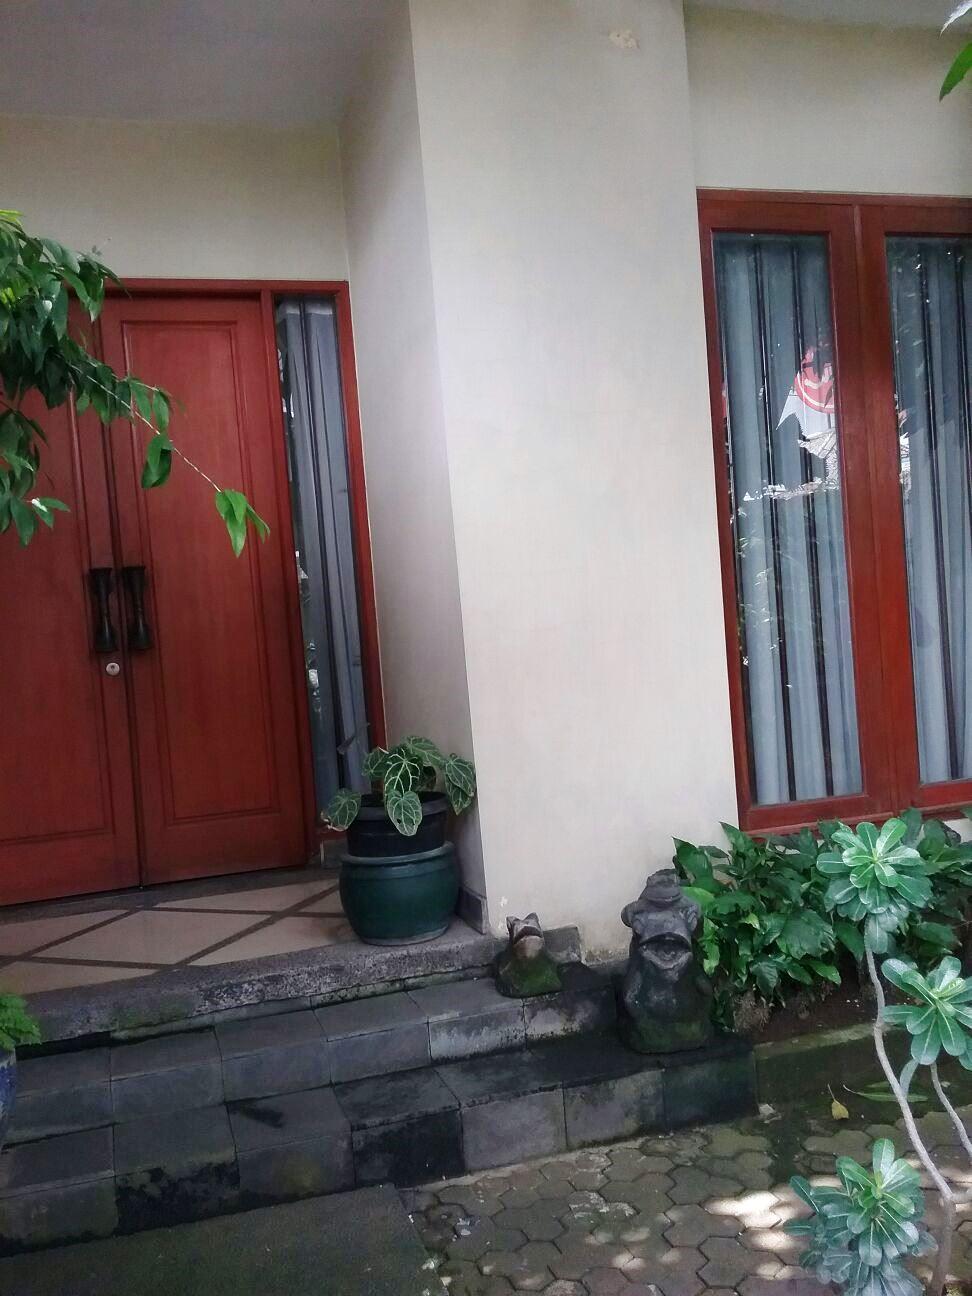 Dijual Rumah asri nyaman, aman, siap huni Di @Raya Ceger, Tangsel